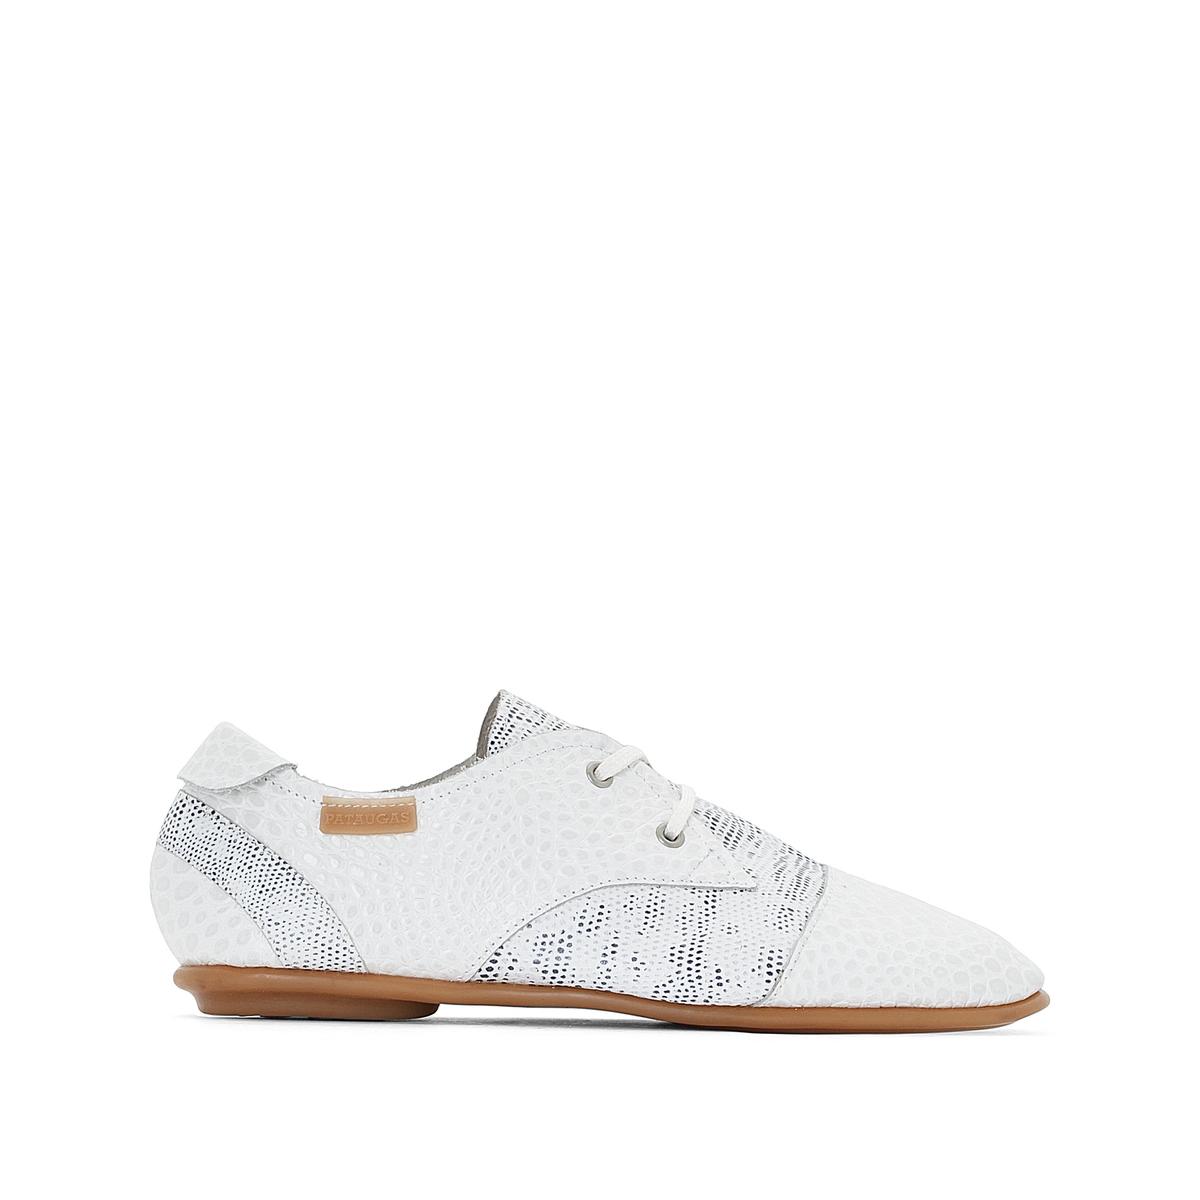 Ботинки-дерби на шнуровке из кожи, Swing ботинки дерби из мягкой кожи takarika